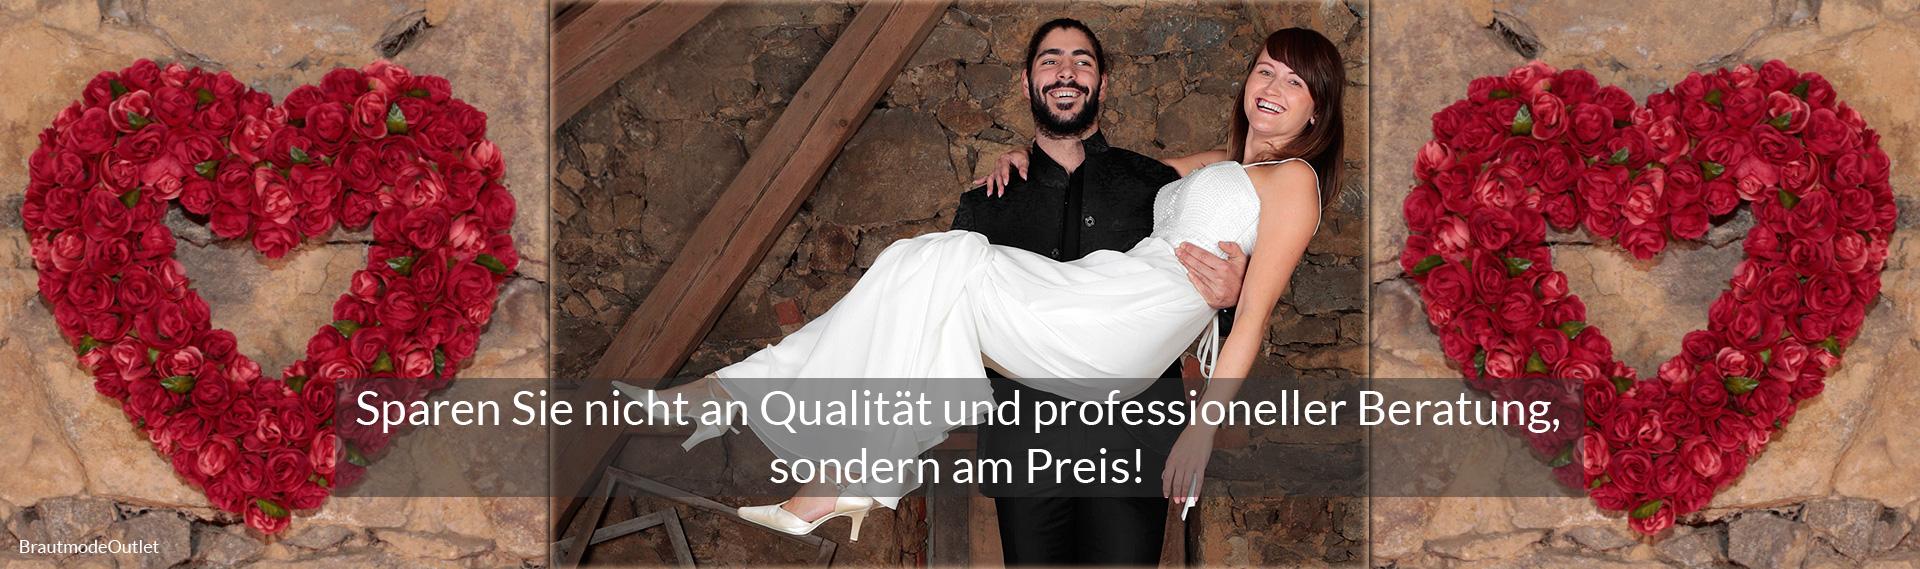 BrautmodeOutlet Bautzen Outlet Brautmode Qualität Preis